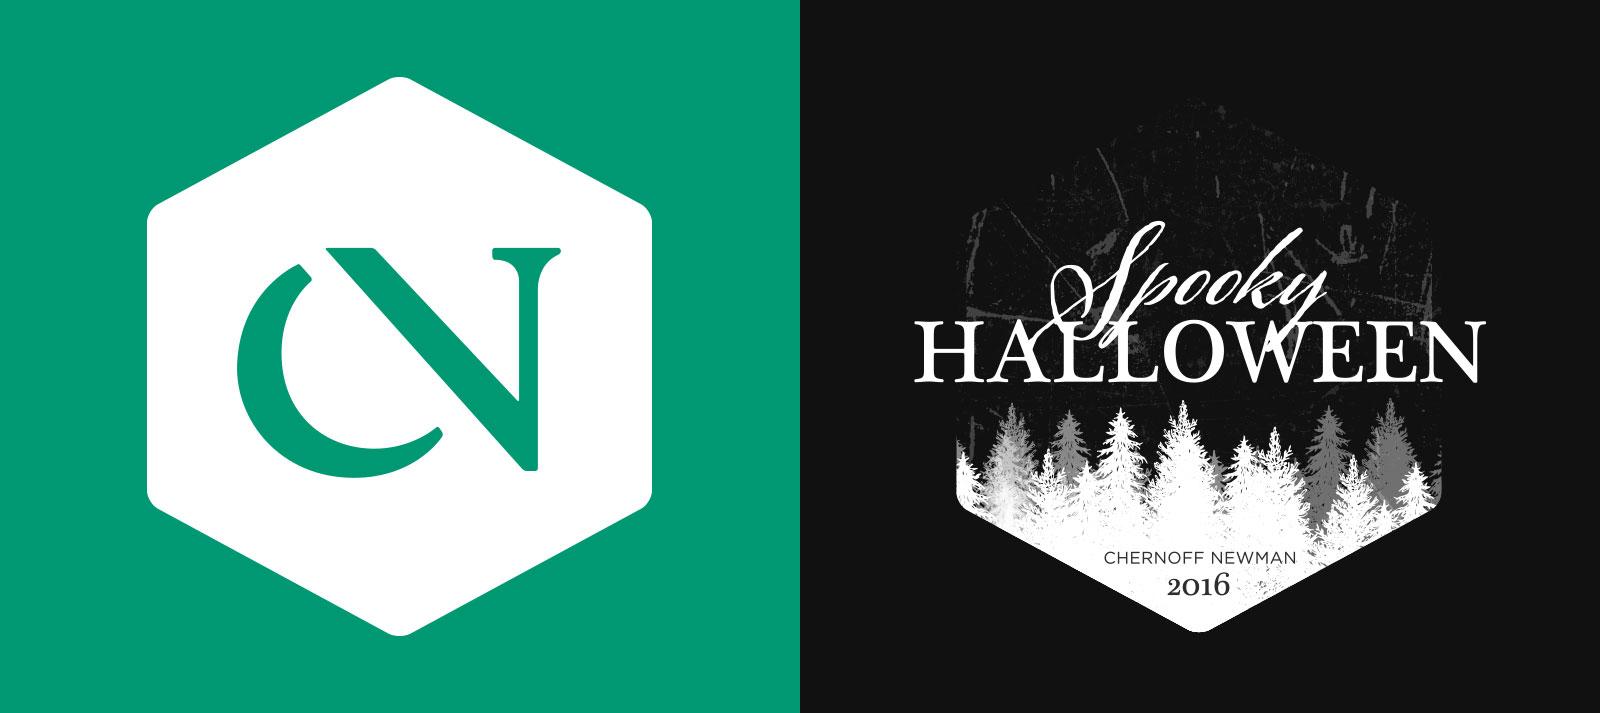 cn-logo-vs-halloween-logo